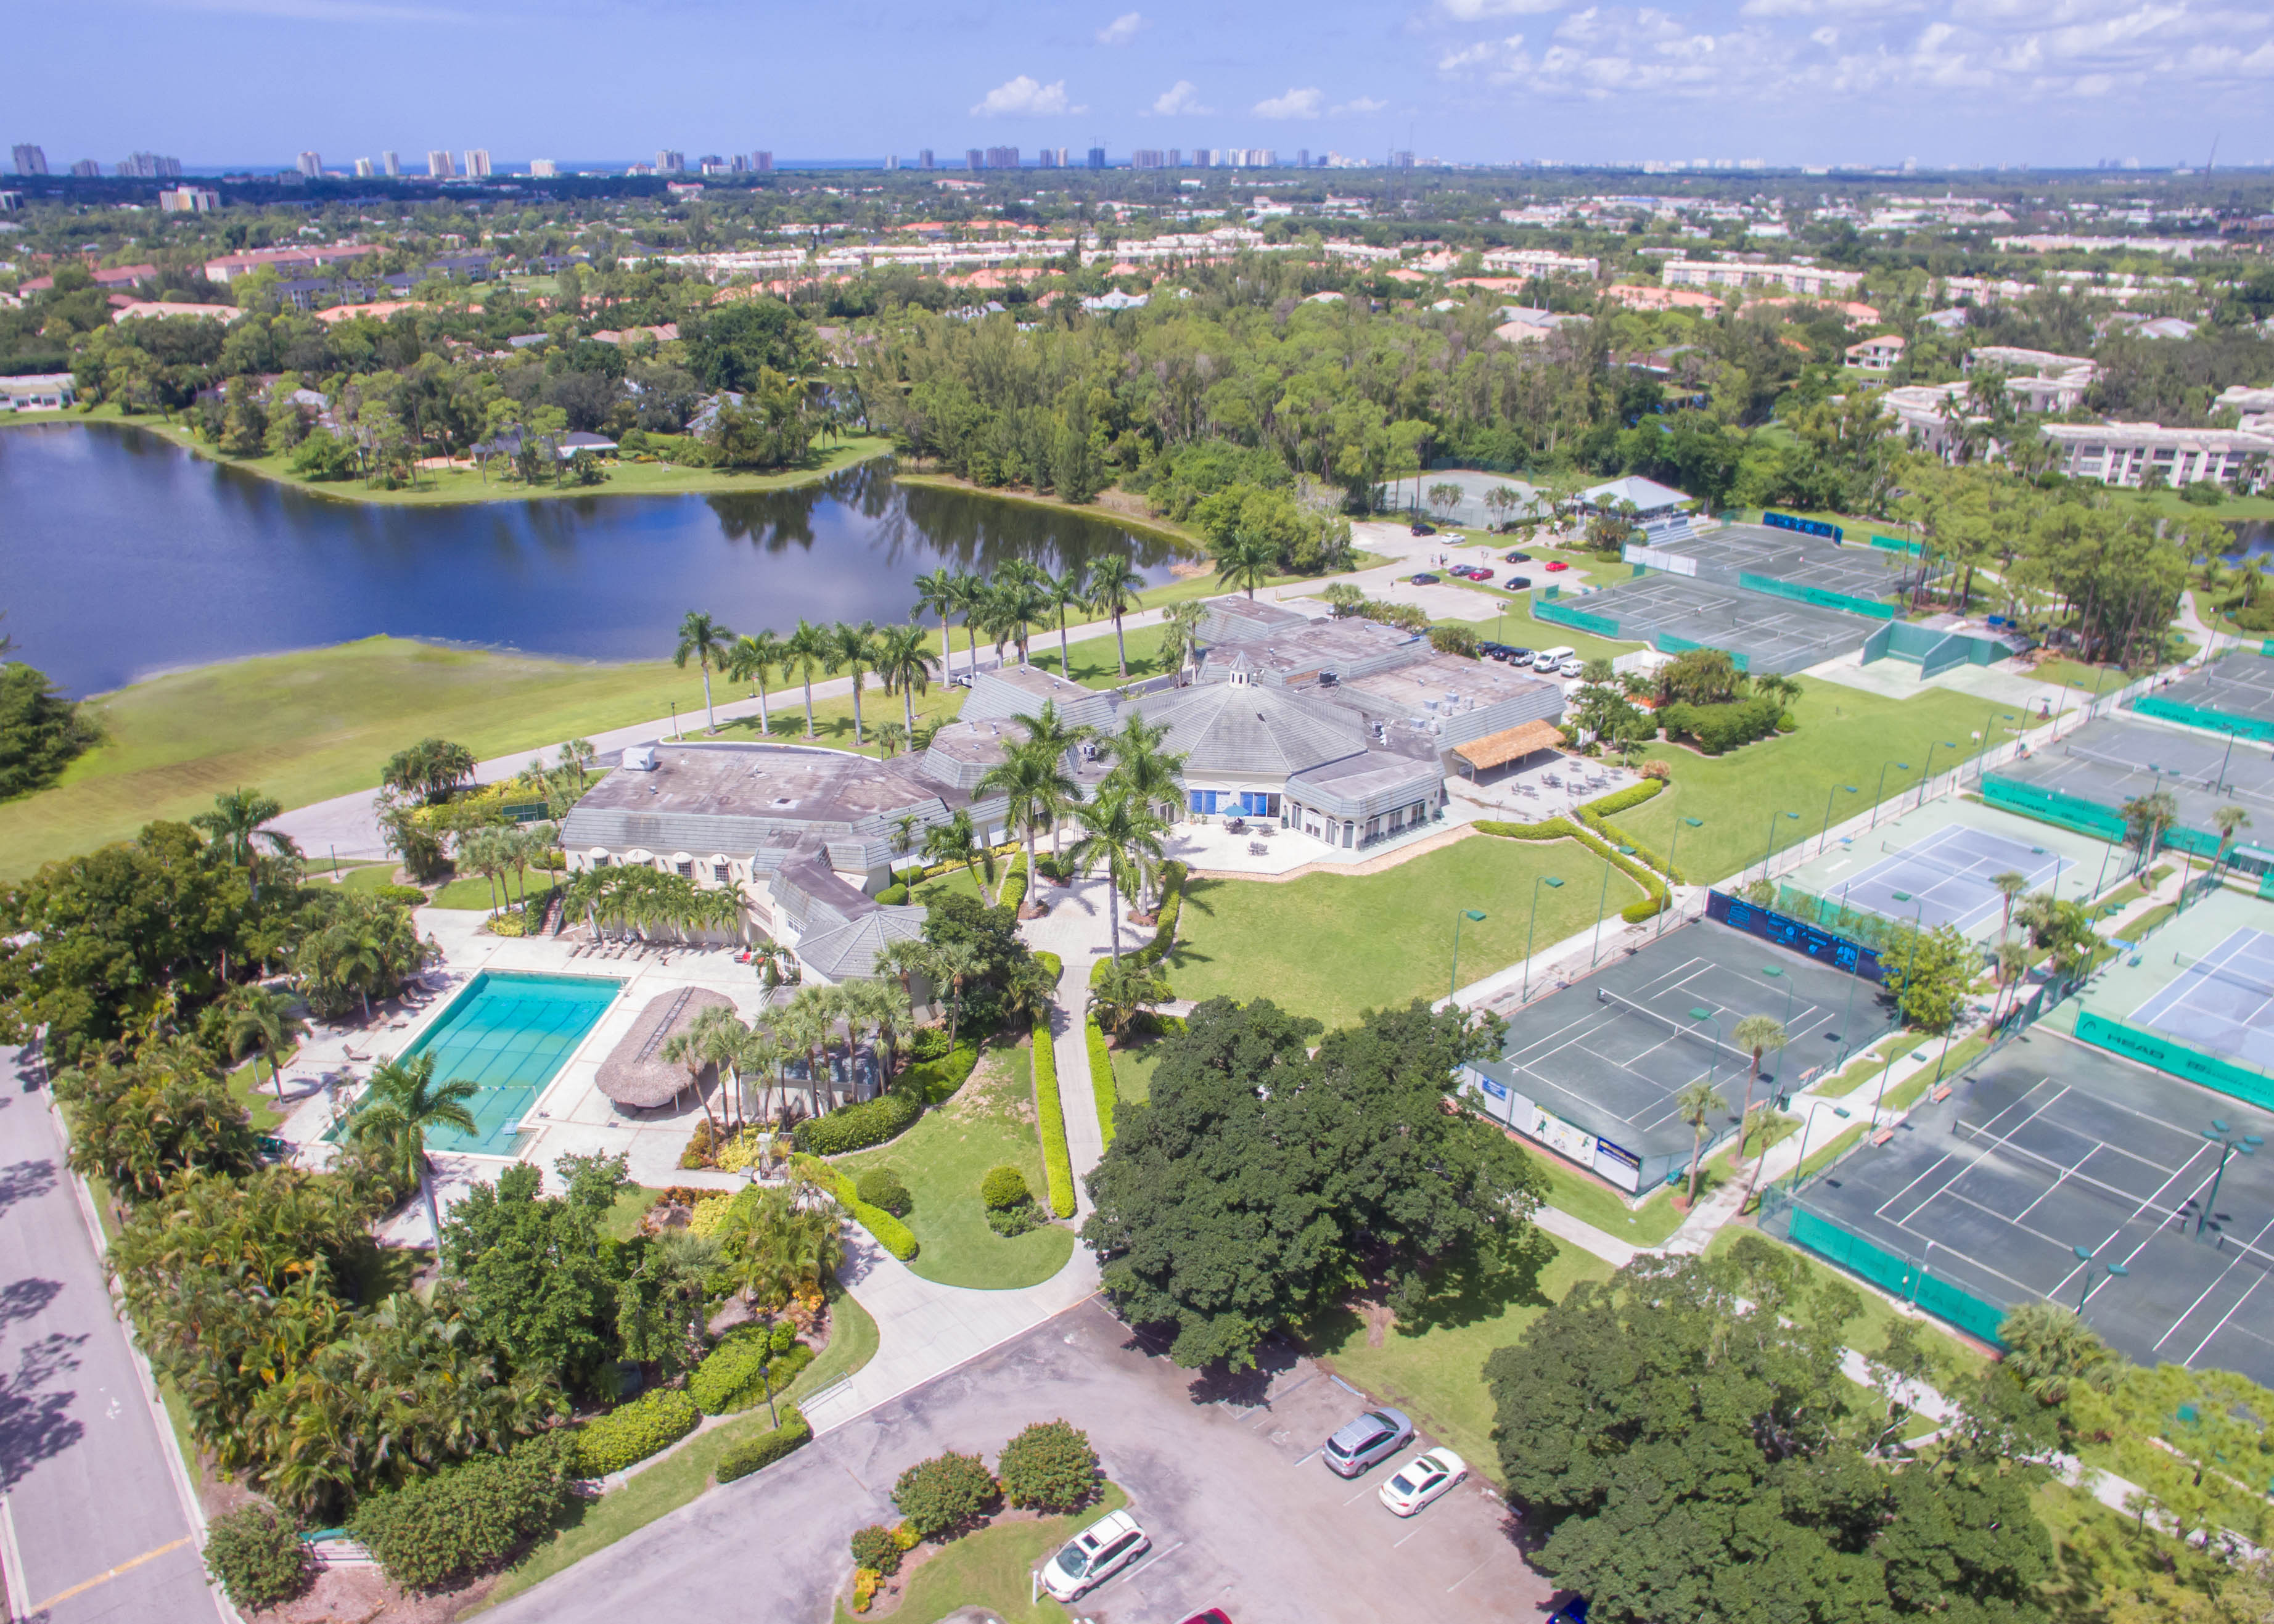 Naples bath and tennis club immobilien florida kaufen for Innendekorateur mieten